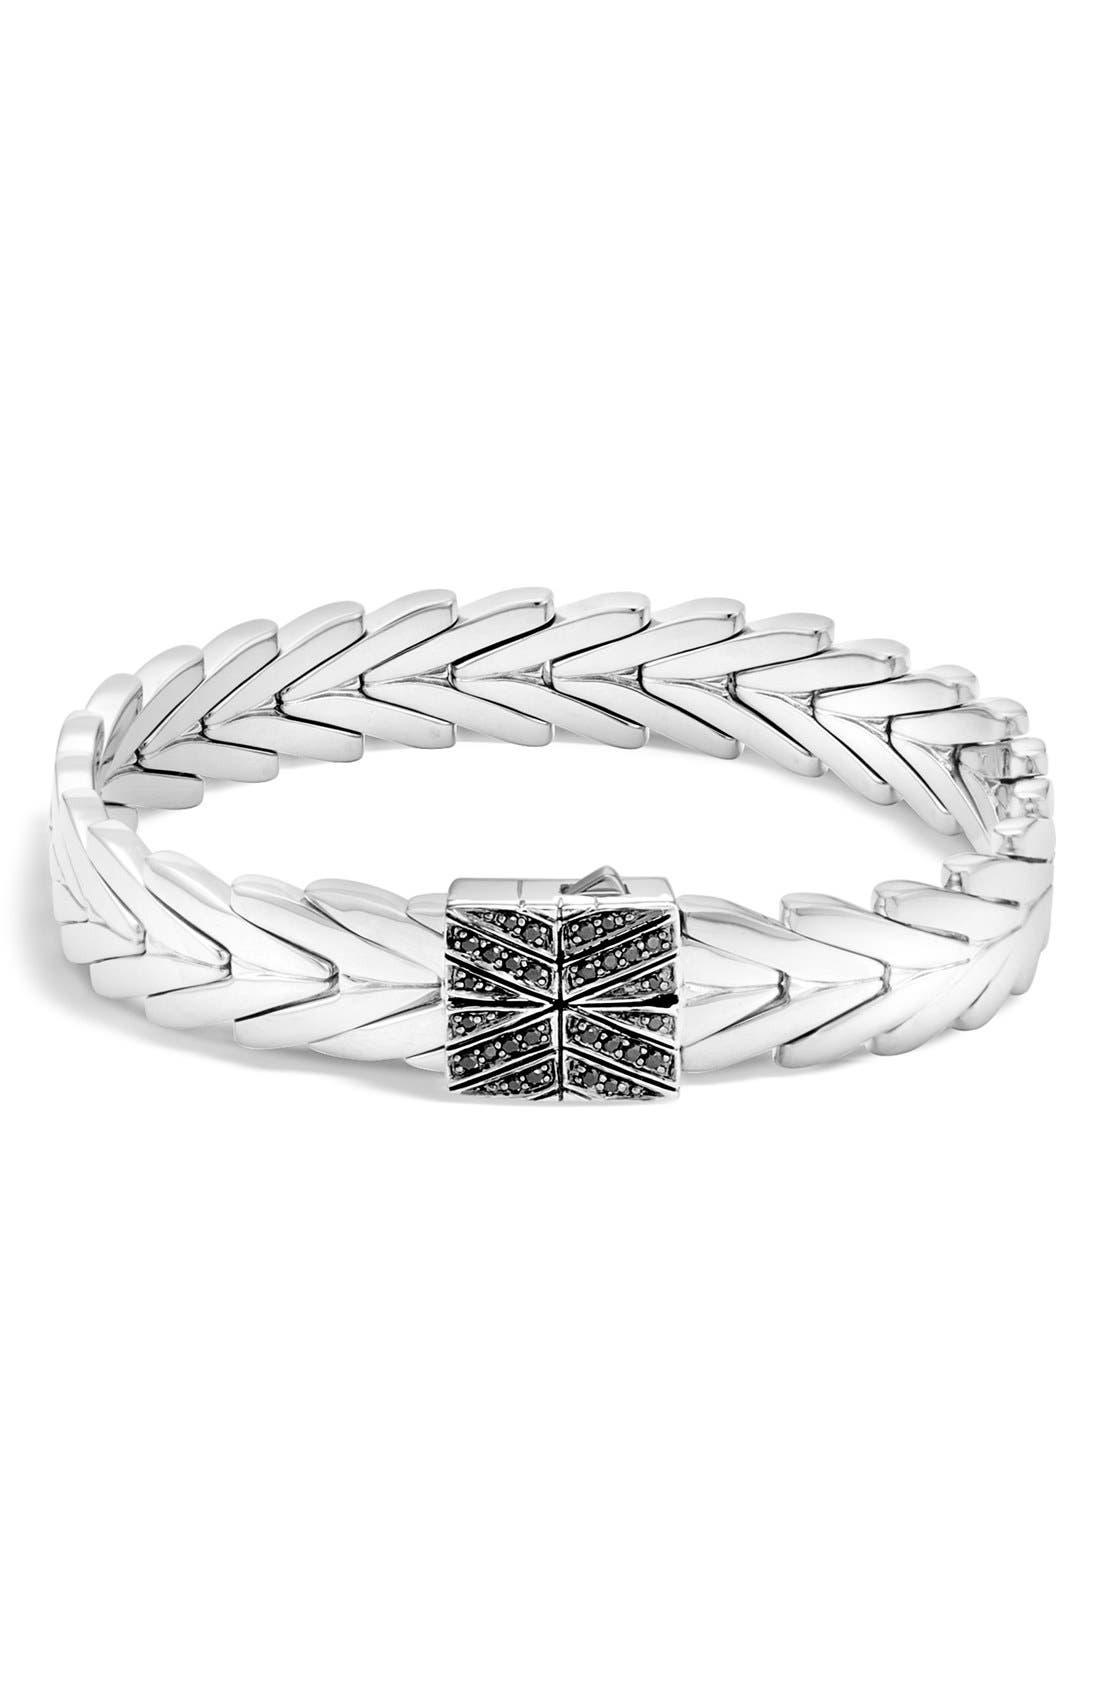 Modern Chain Lava Bracelet,                             Main thumbnail 1, color,                             SILVER